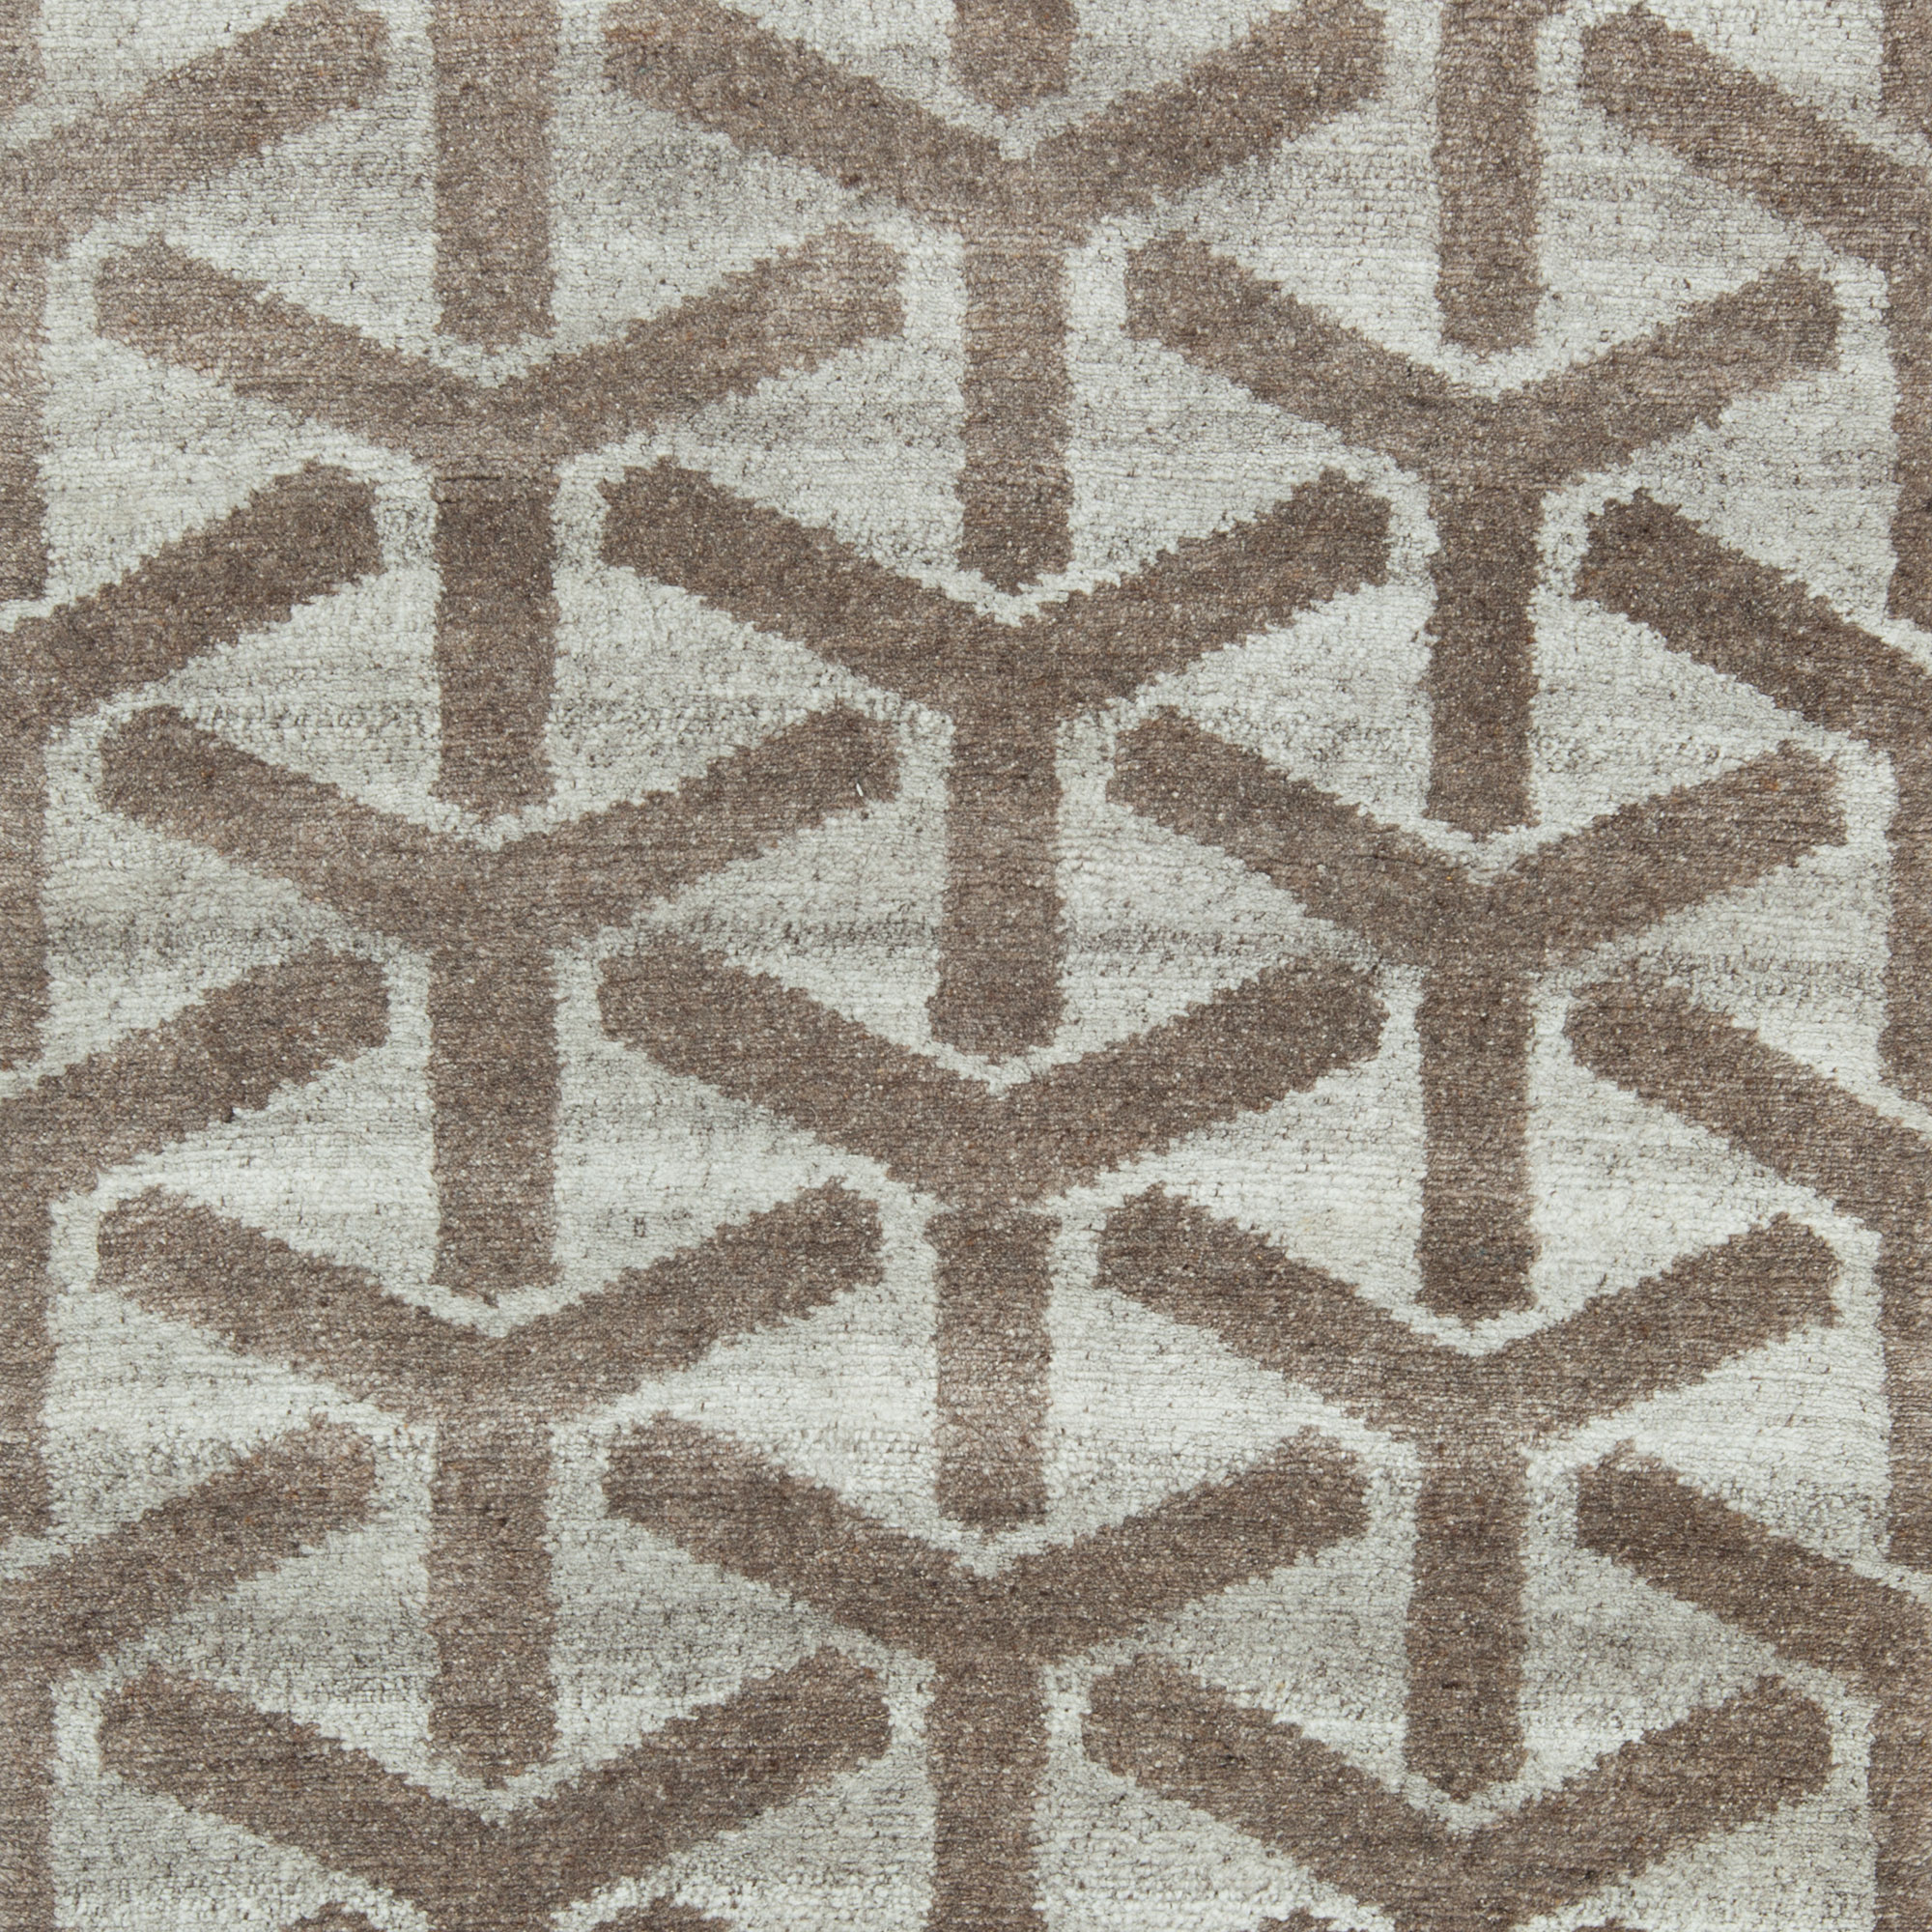 Geometric Design S11665 S11665